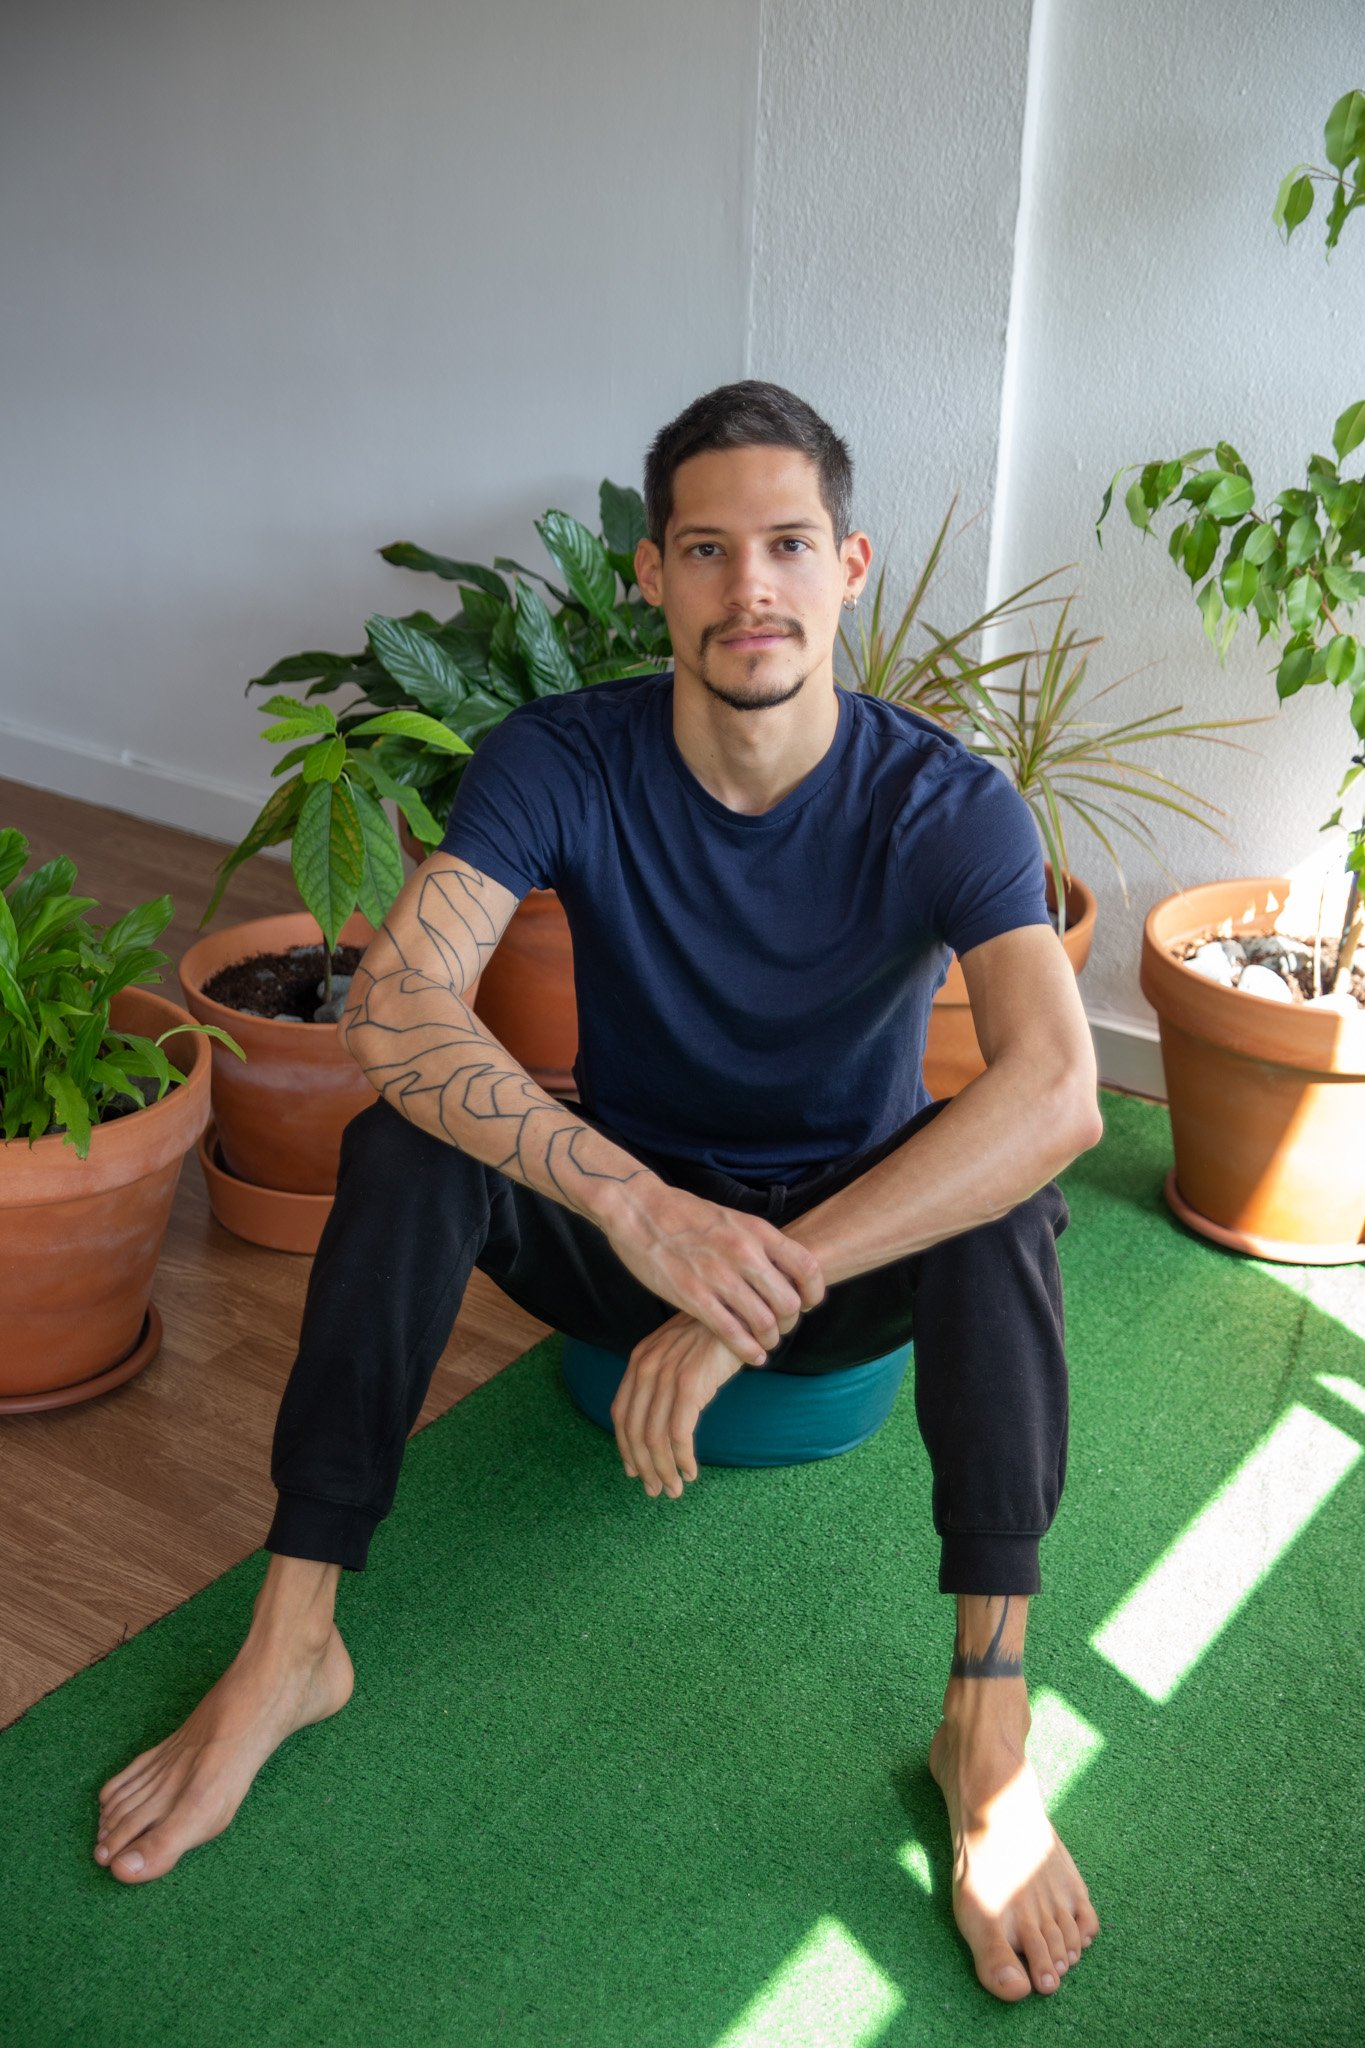 dan-padrino-daniel-padrino-meditation-instructor-mindfulnes-stay-mindful-corporate-meditation-program-online-meditation-2